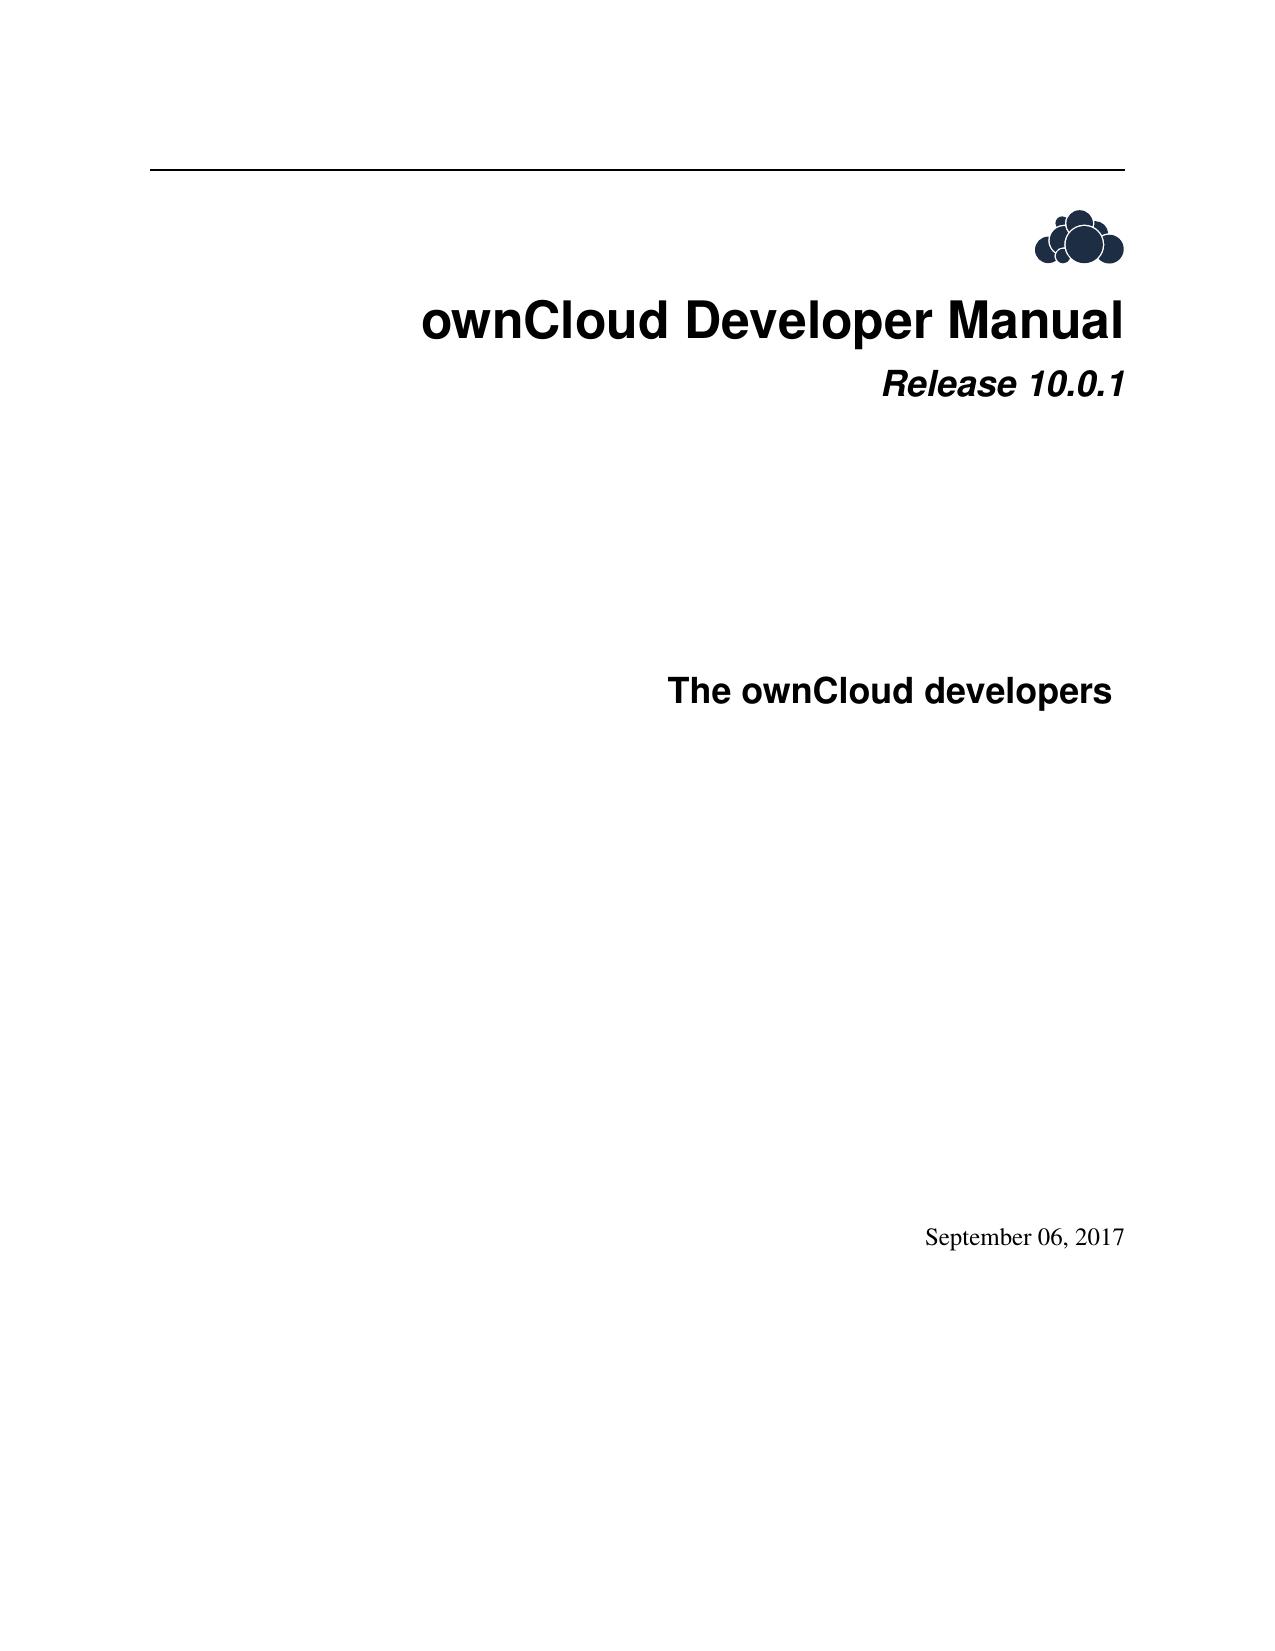 ownCloud Developer Manual | manualzz com